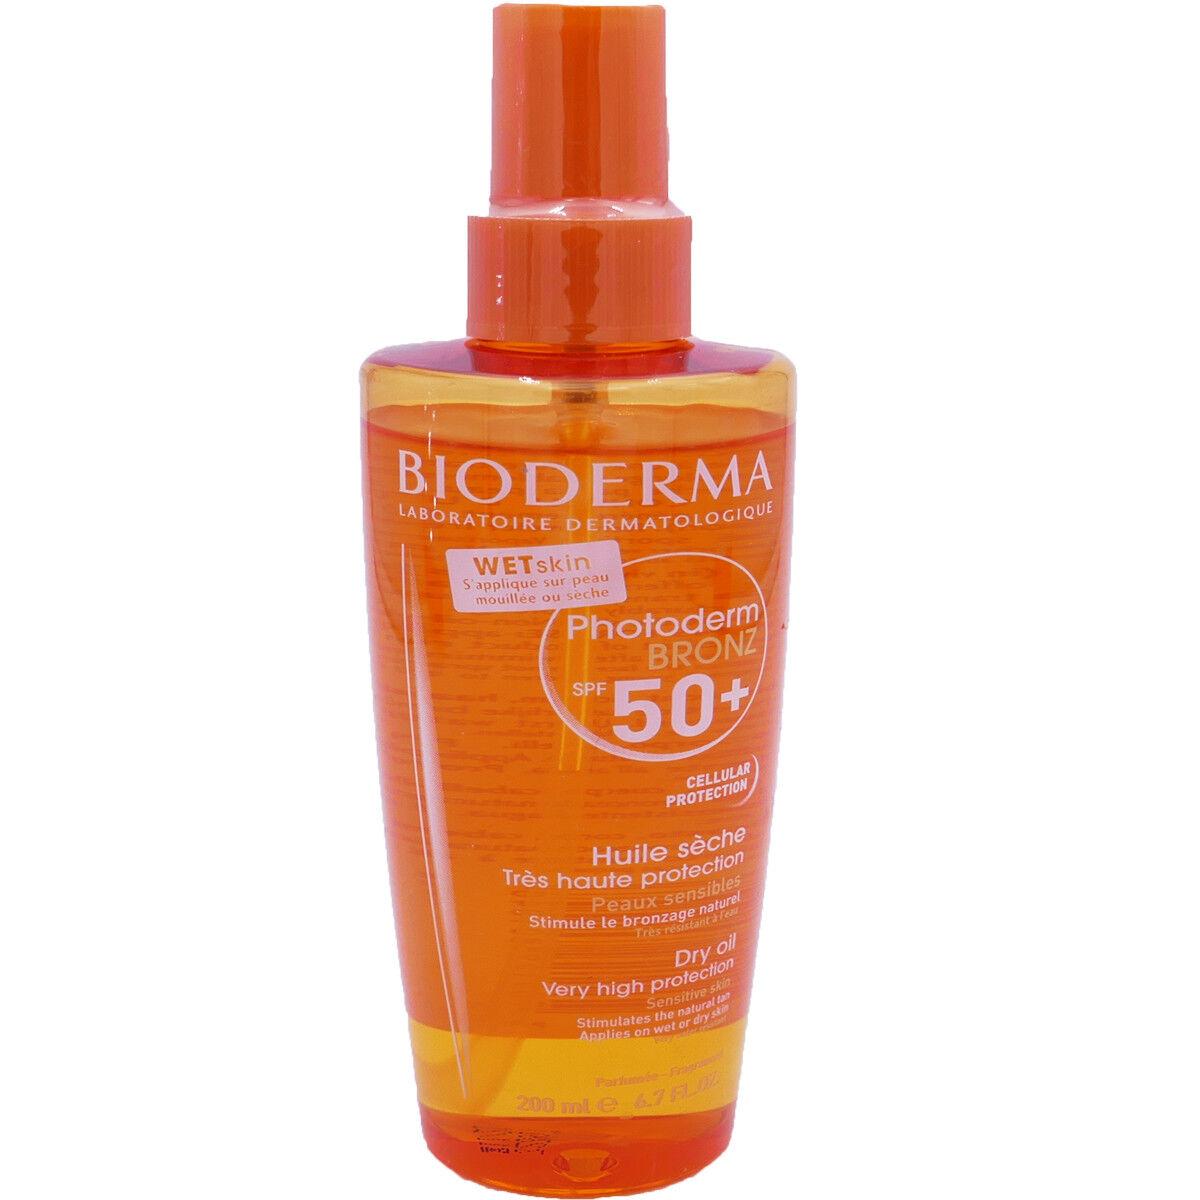 Bioderma photoderm bronz spf 50+ huile seche 200 ml